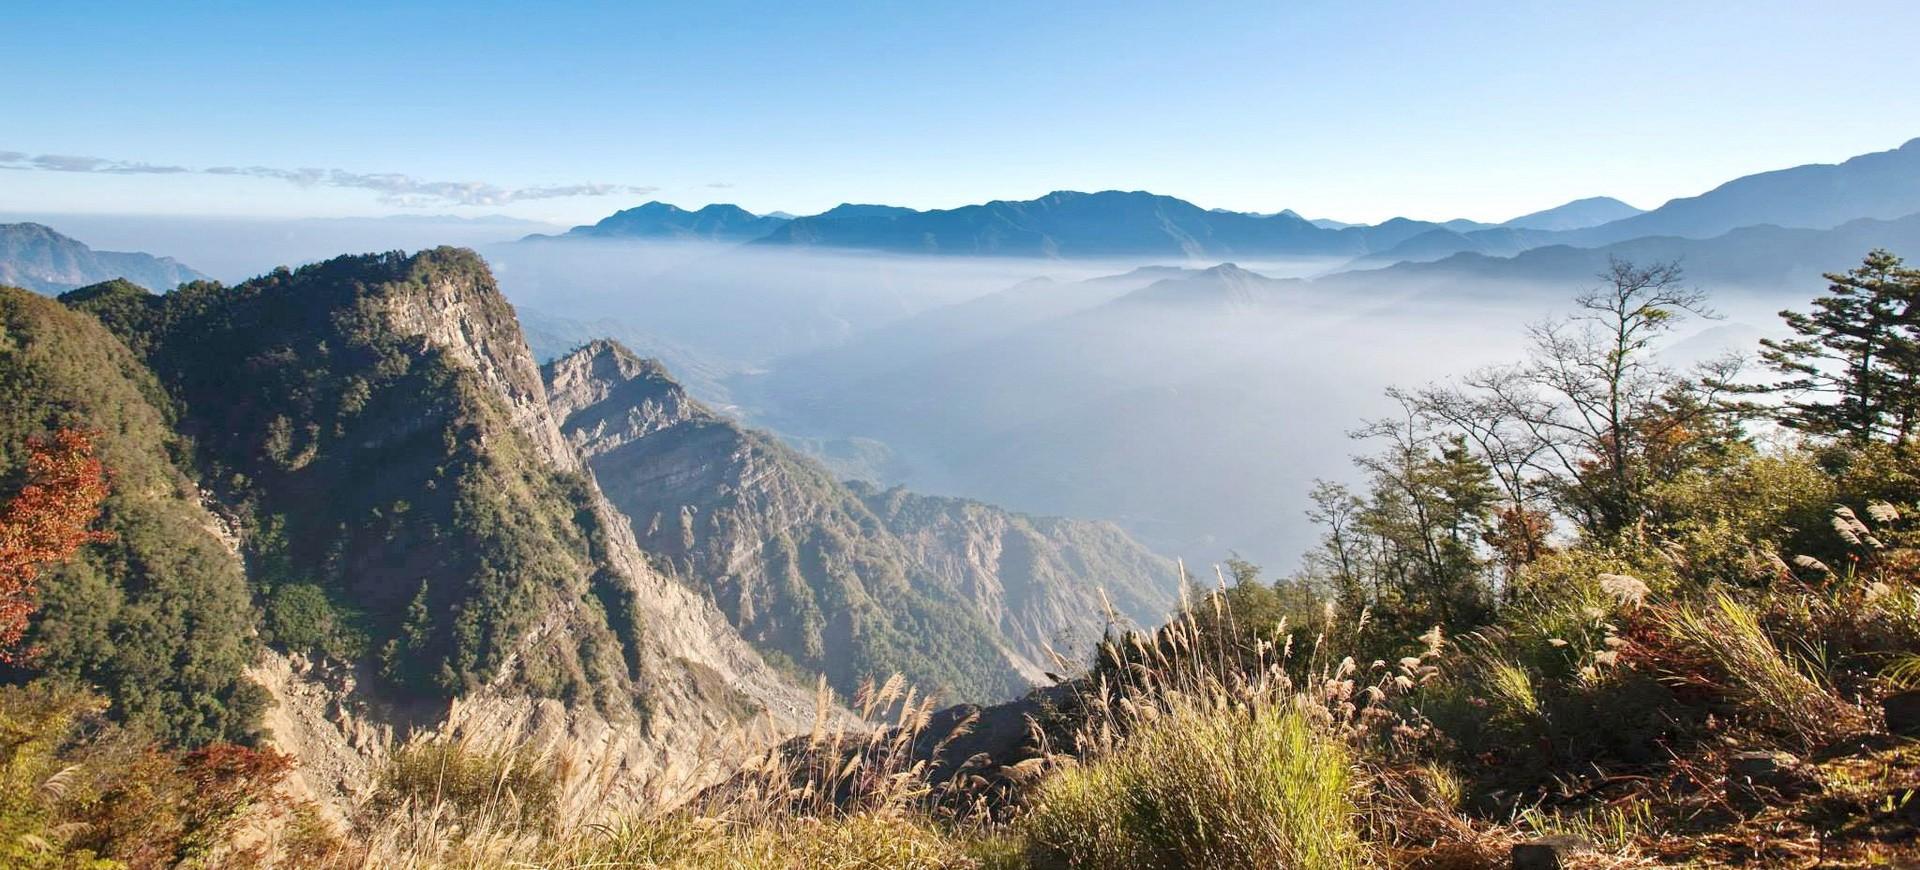 Montagne à Alishan à Taiwan